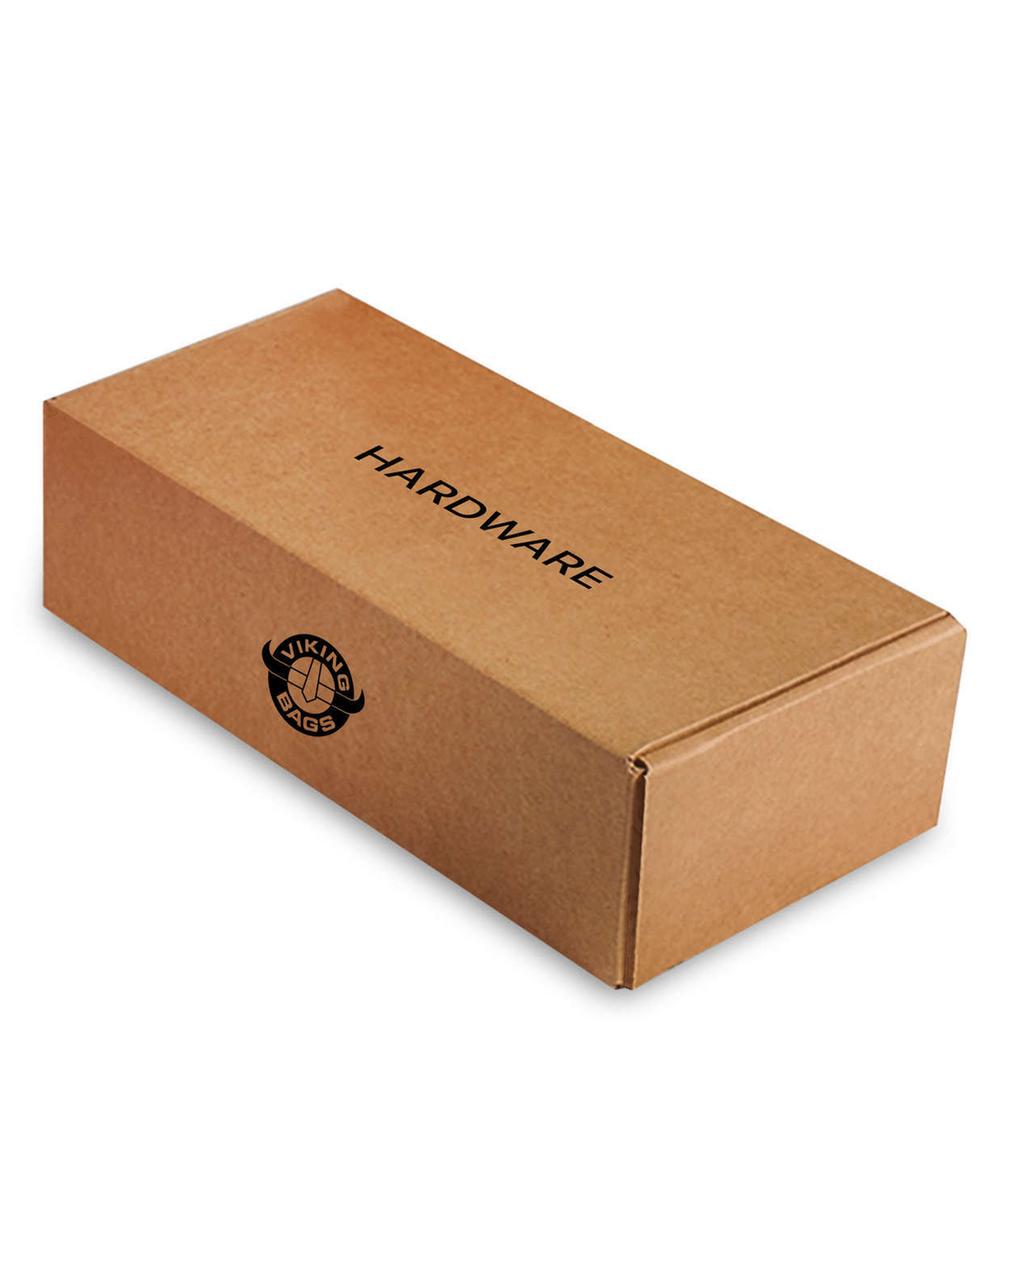 Honda VTX 1800 S Side Pocket Motorcycle Saddlebags box